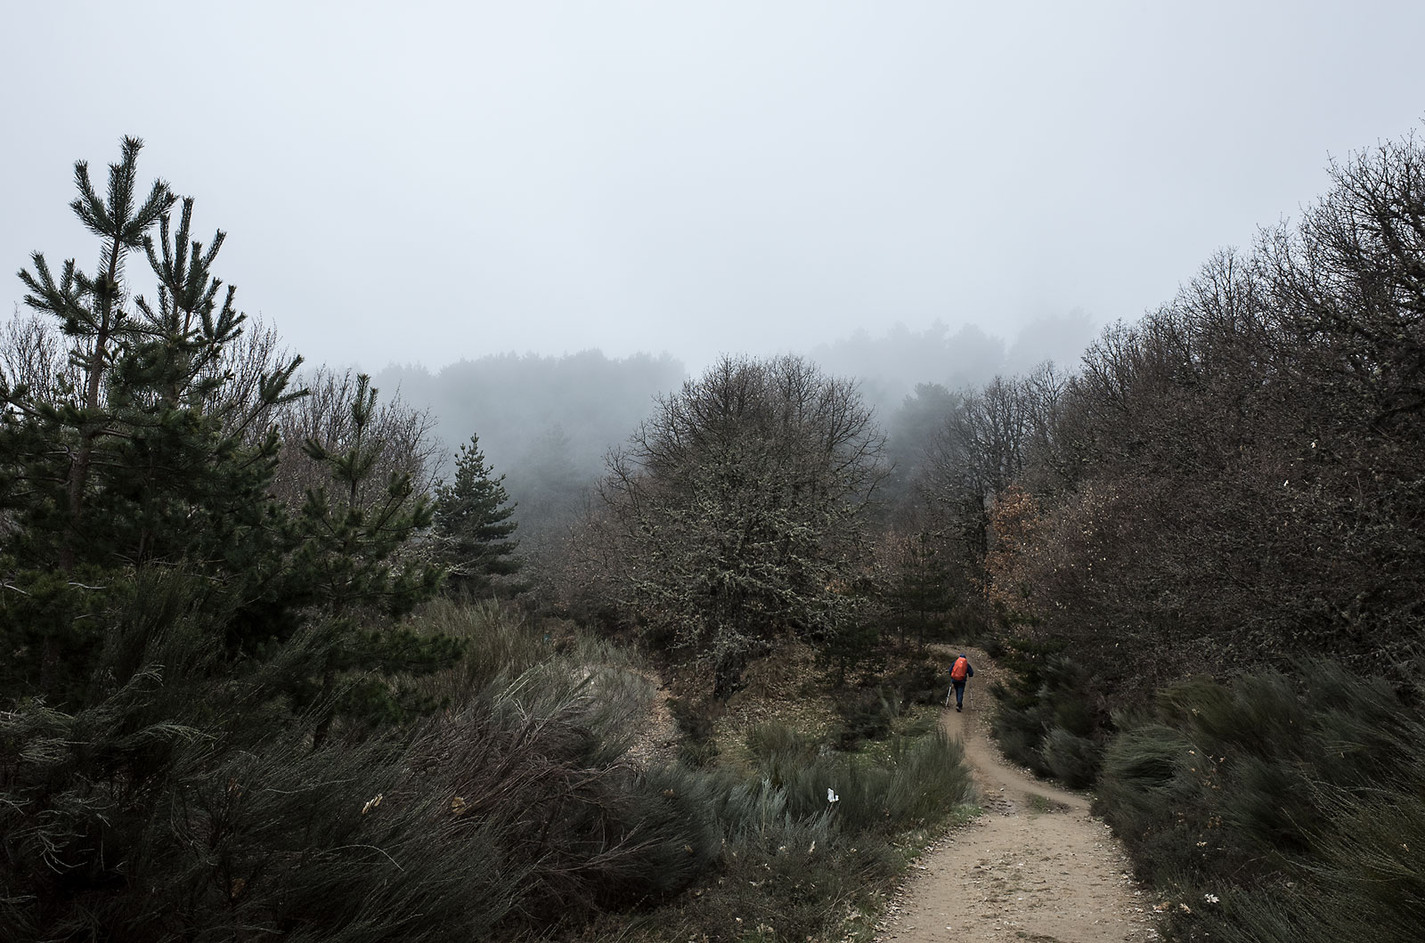 A pilgrim walks the Way through a foggy pine forests.